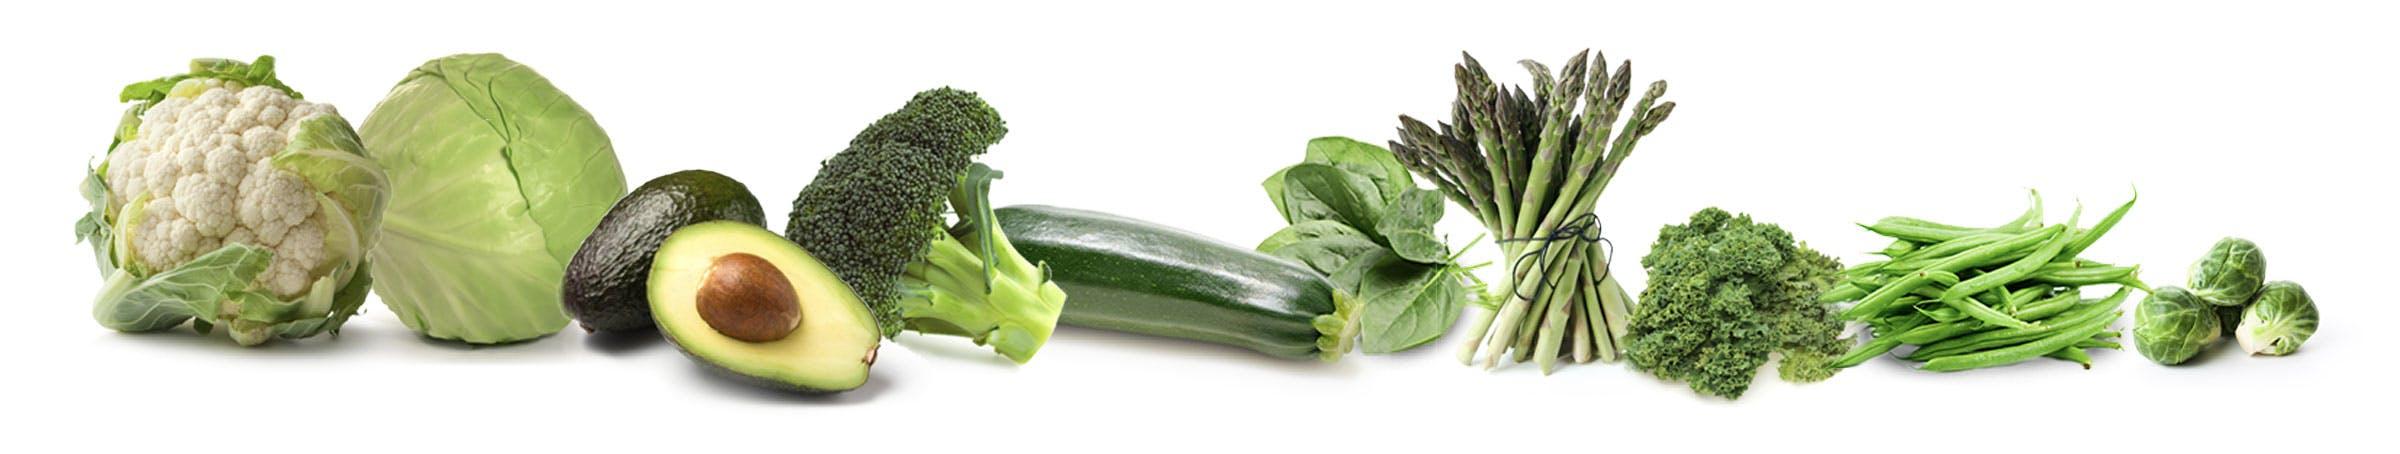 Top 10 Low-Carb Vegetables